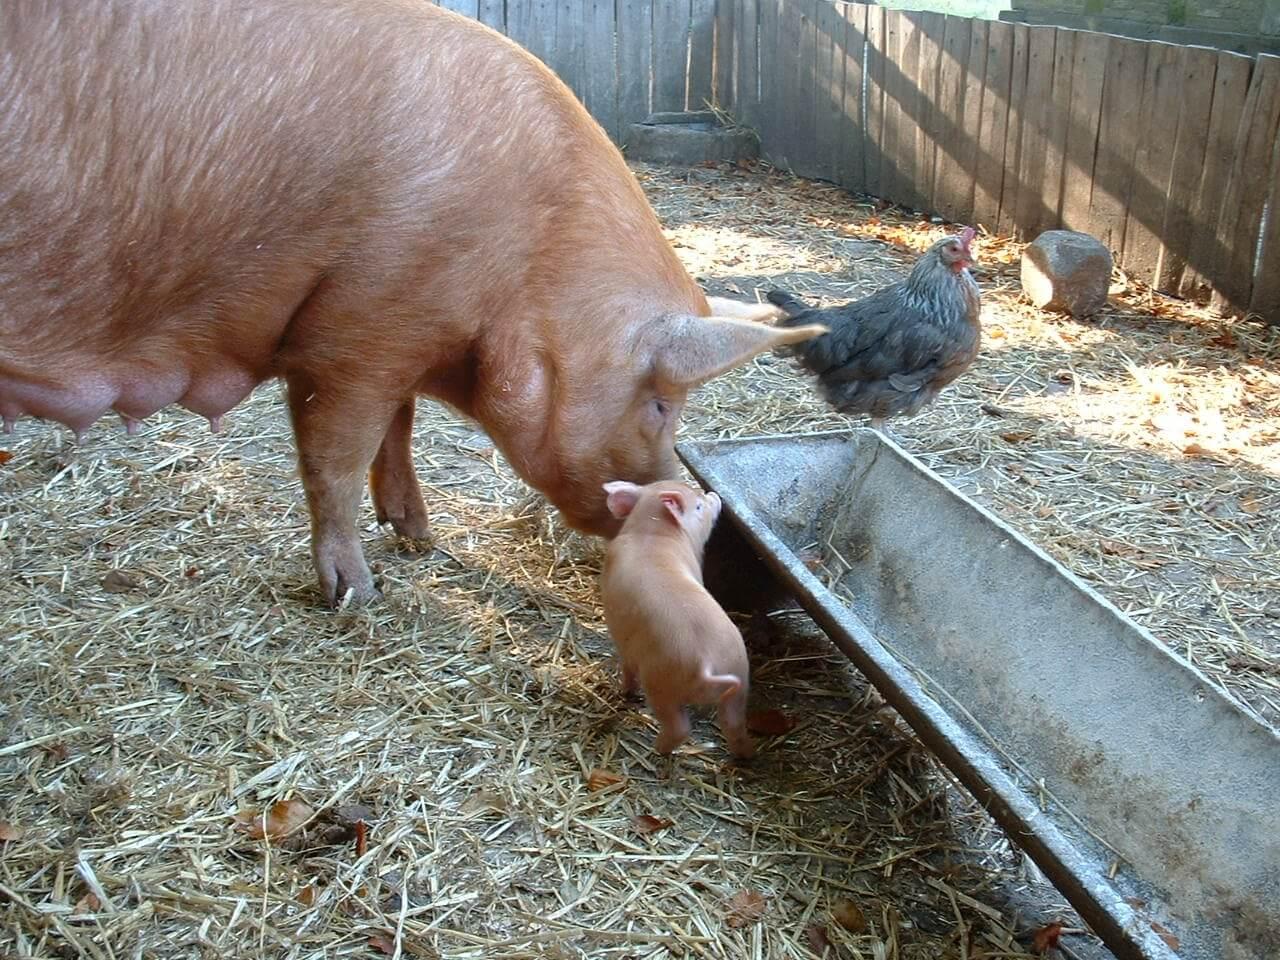 pigs morguefile